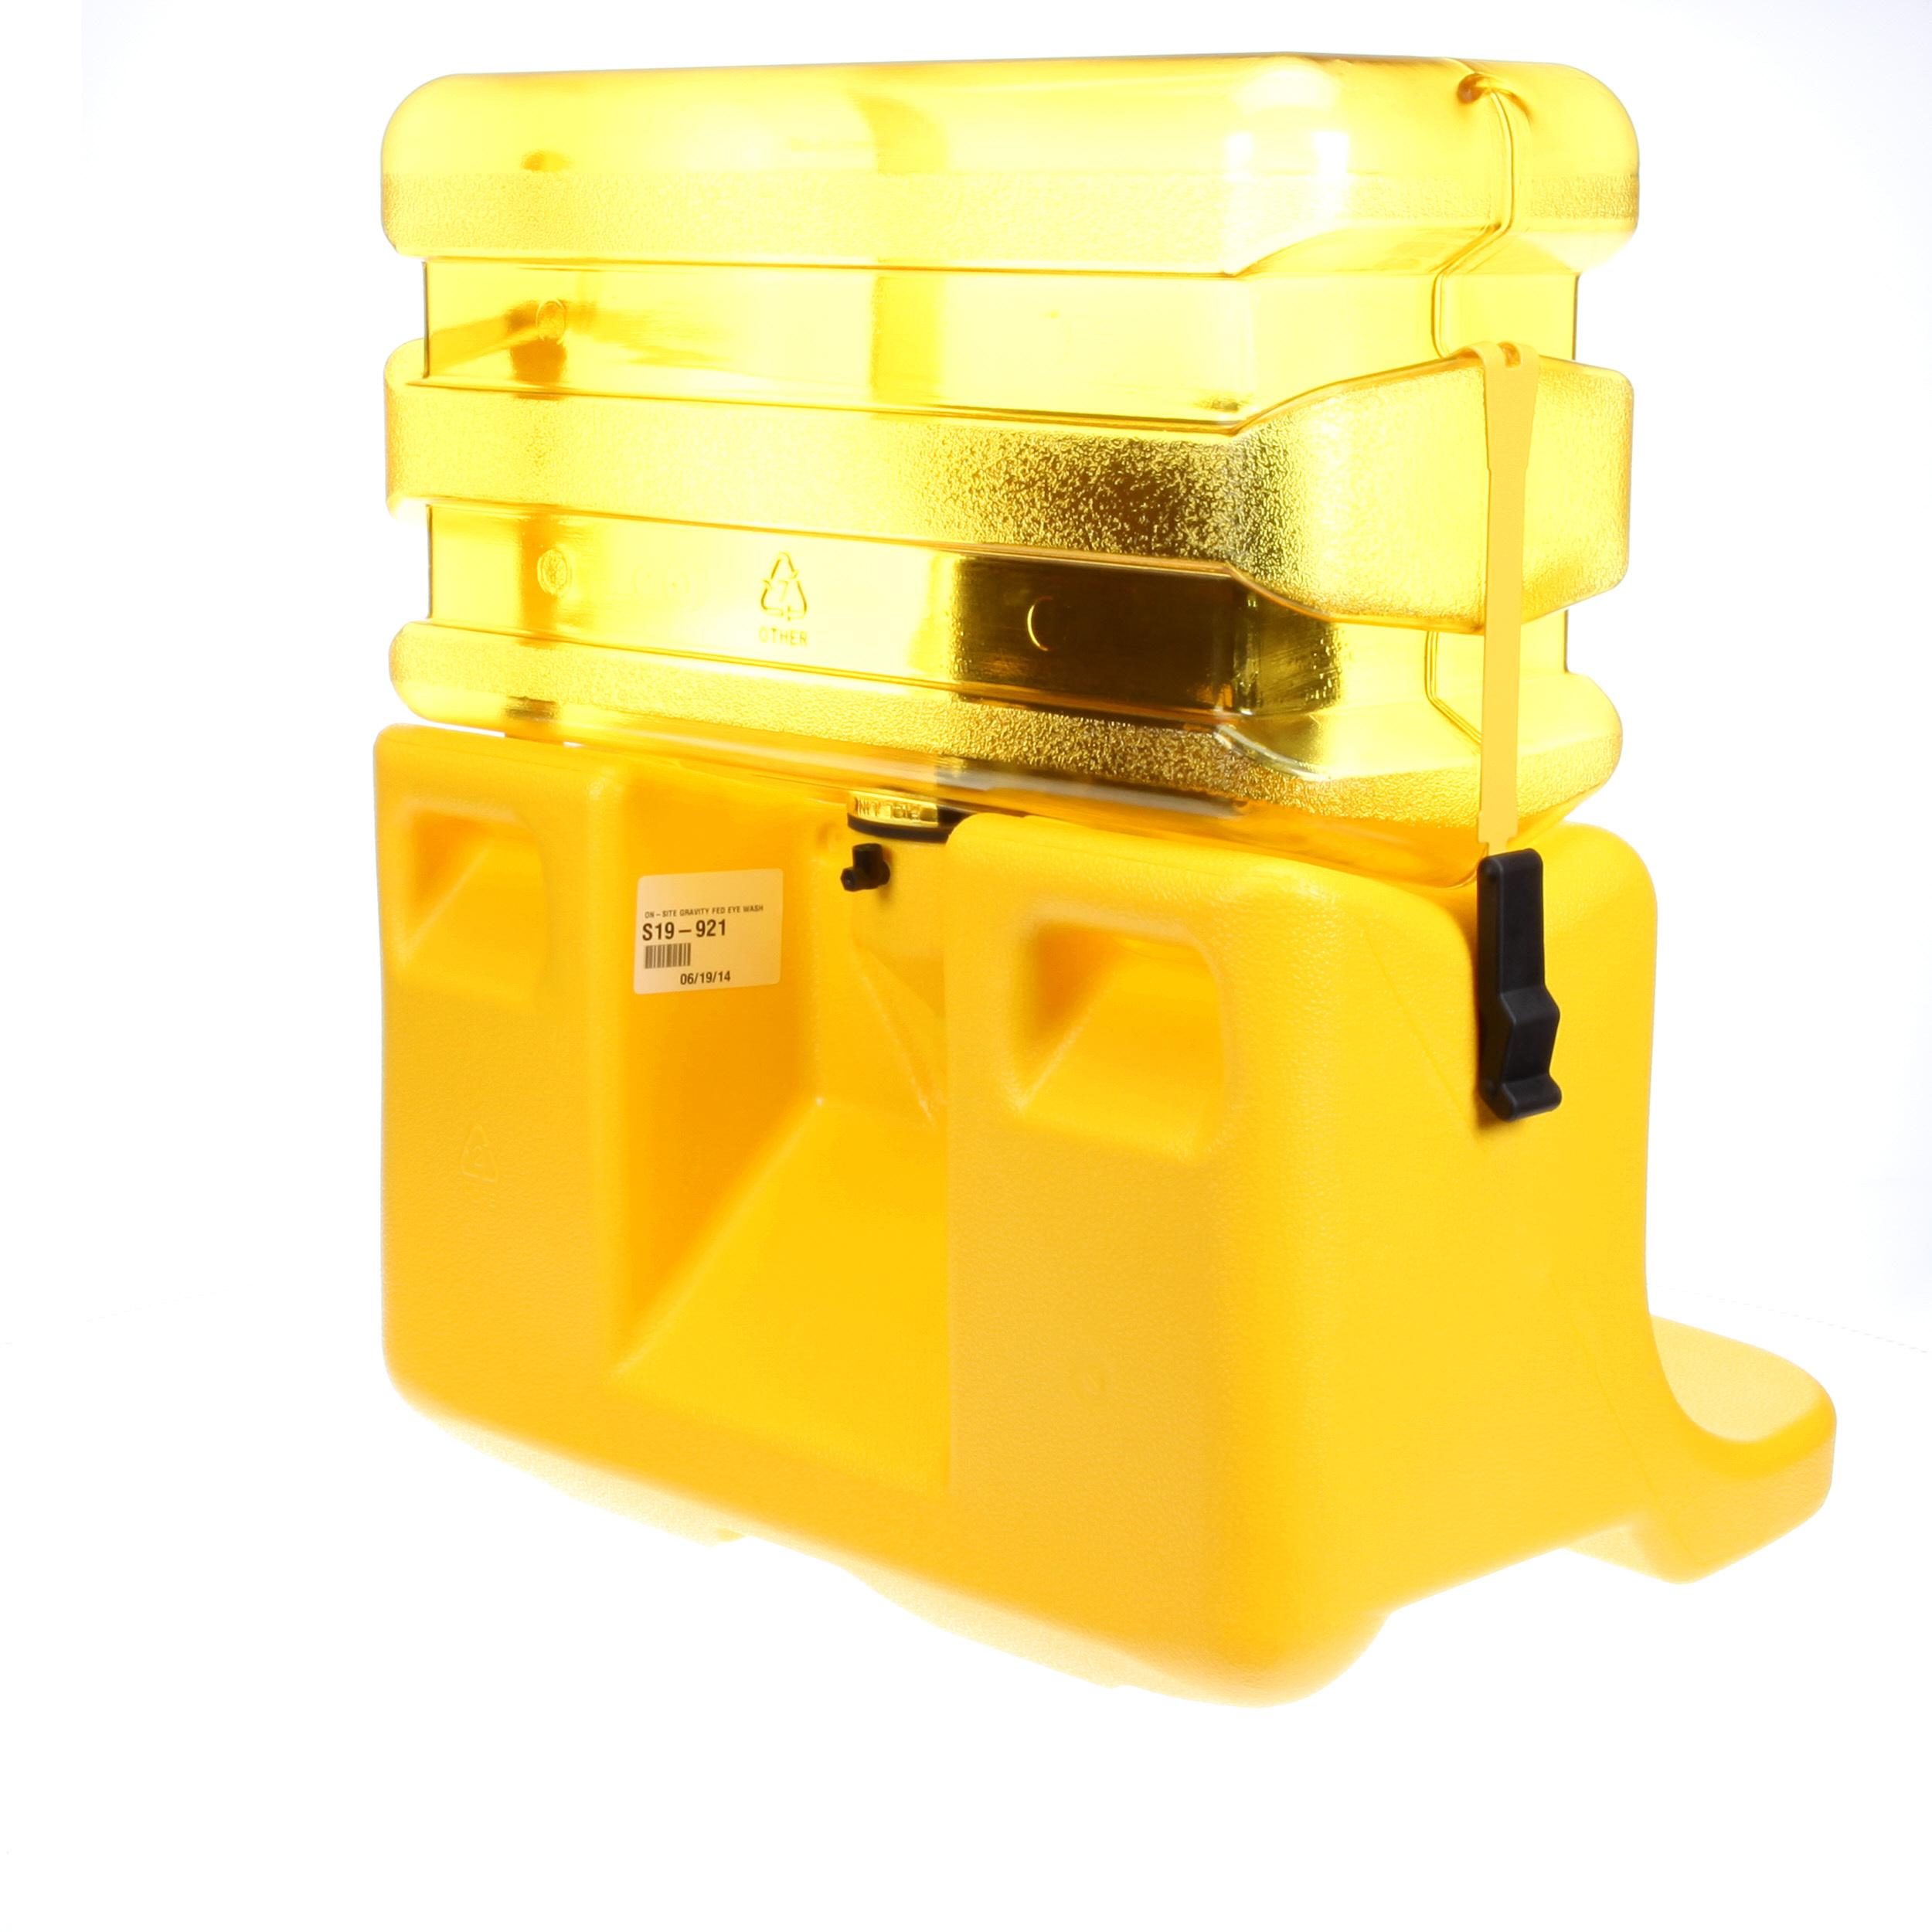 On-site Portable Gravity-fed Eyewash